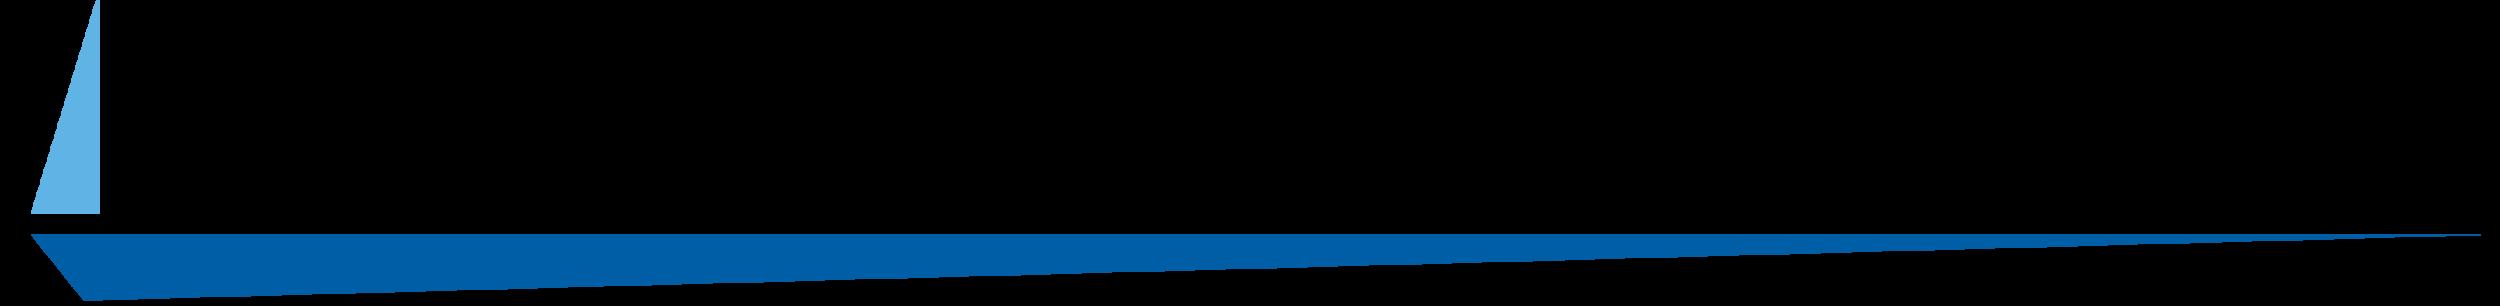 Direction Forward logo 3.01.png